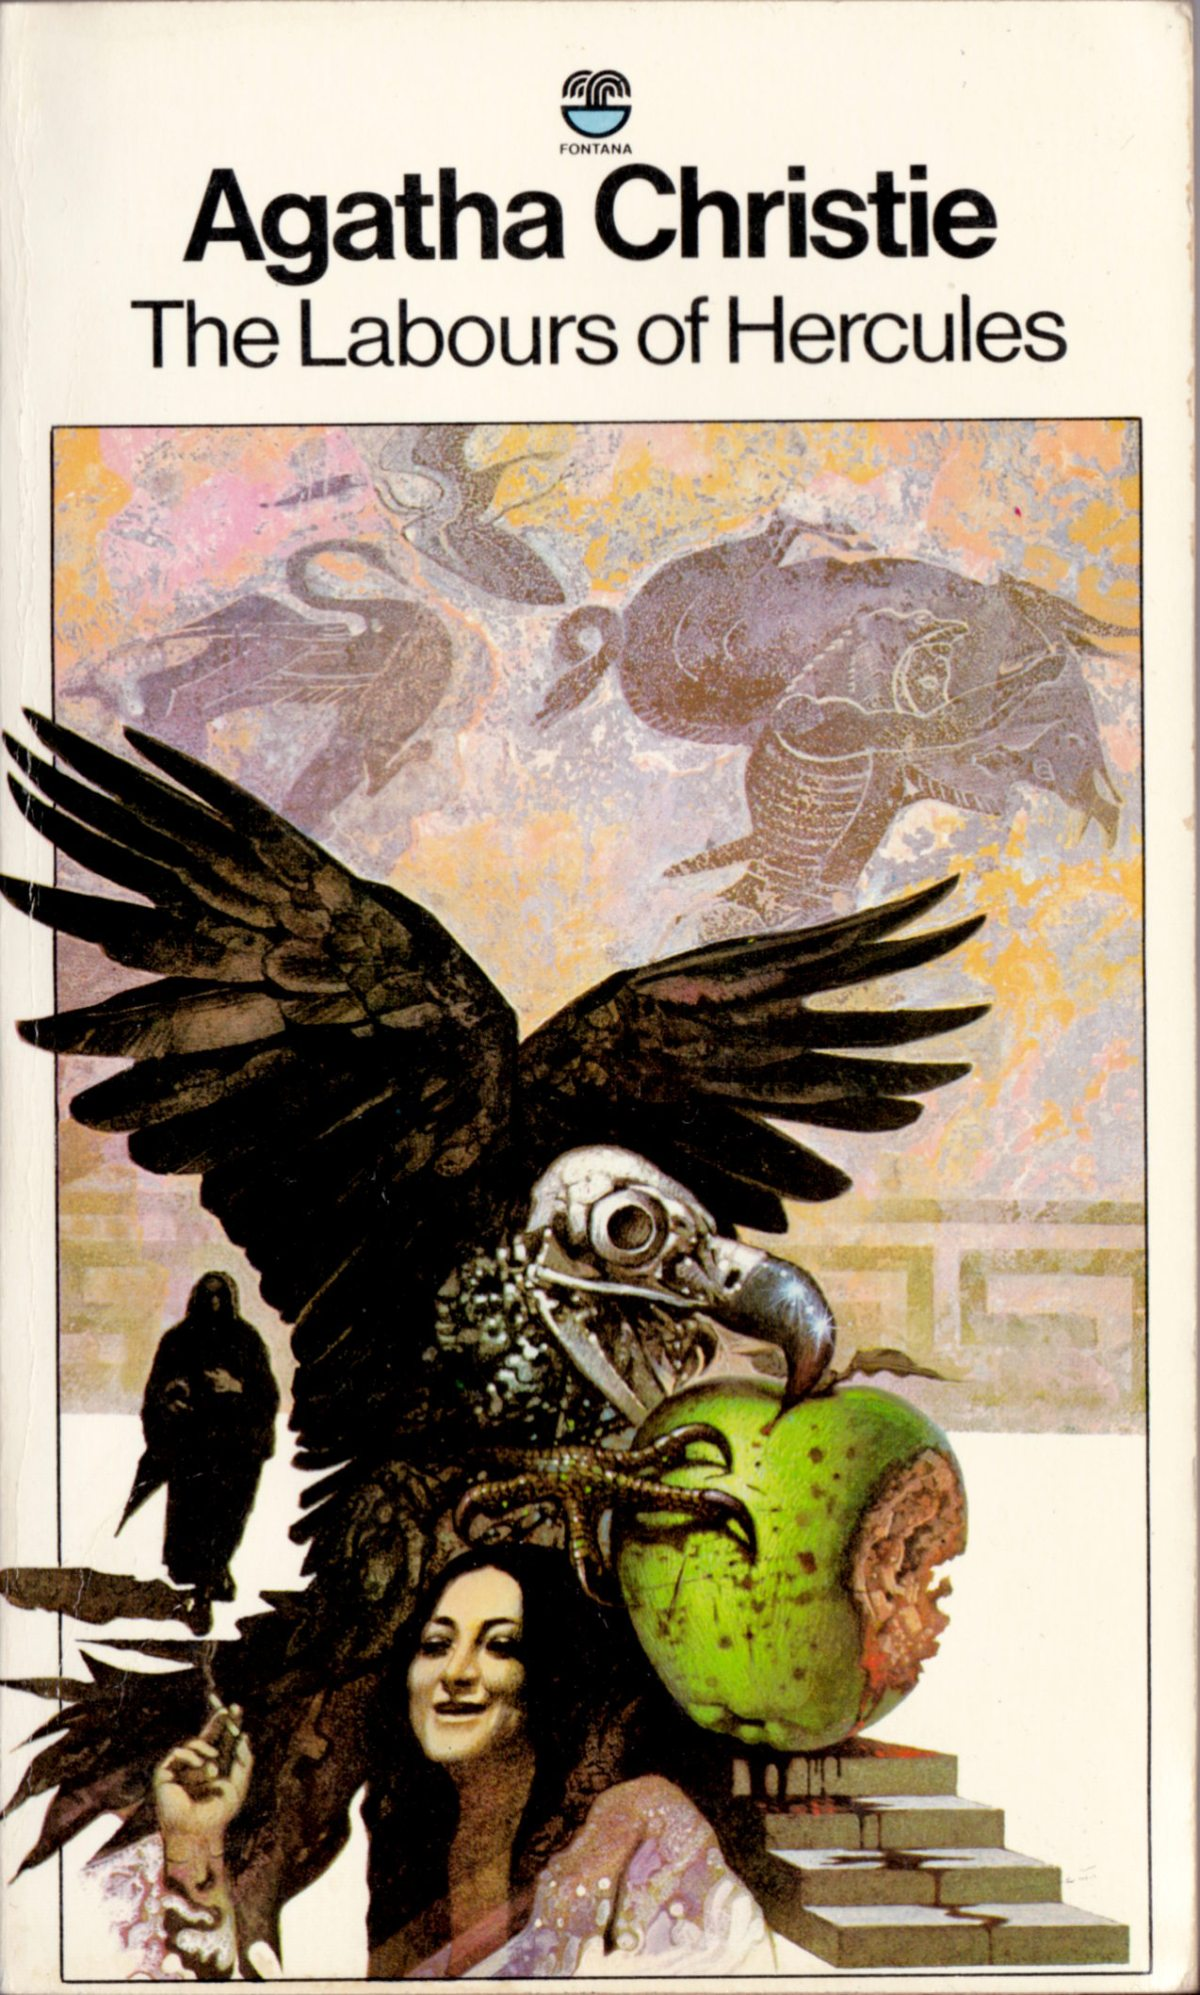 Agatha Christie Tom Adams The Labours of Hercules Fontana 1980